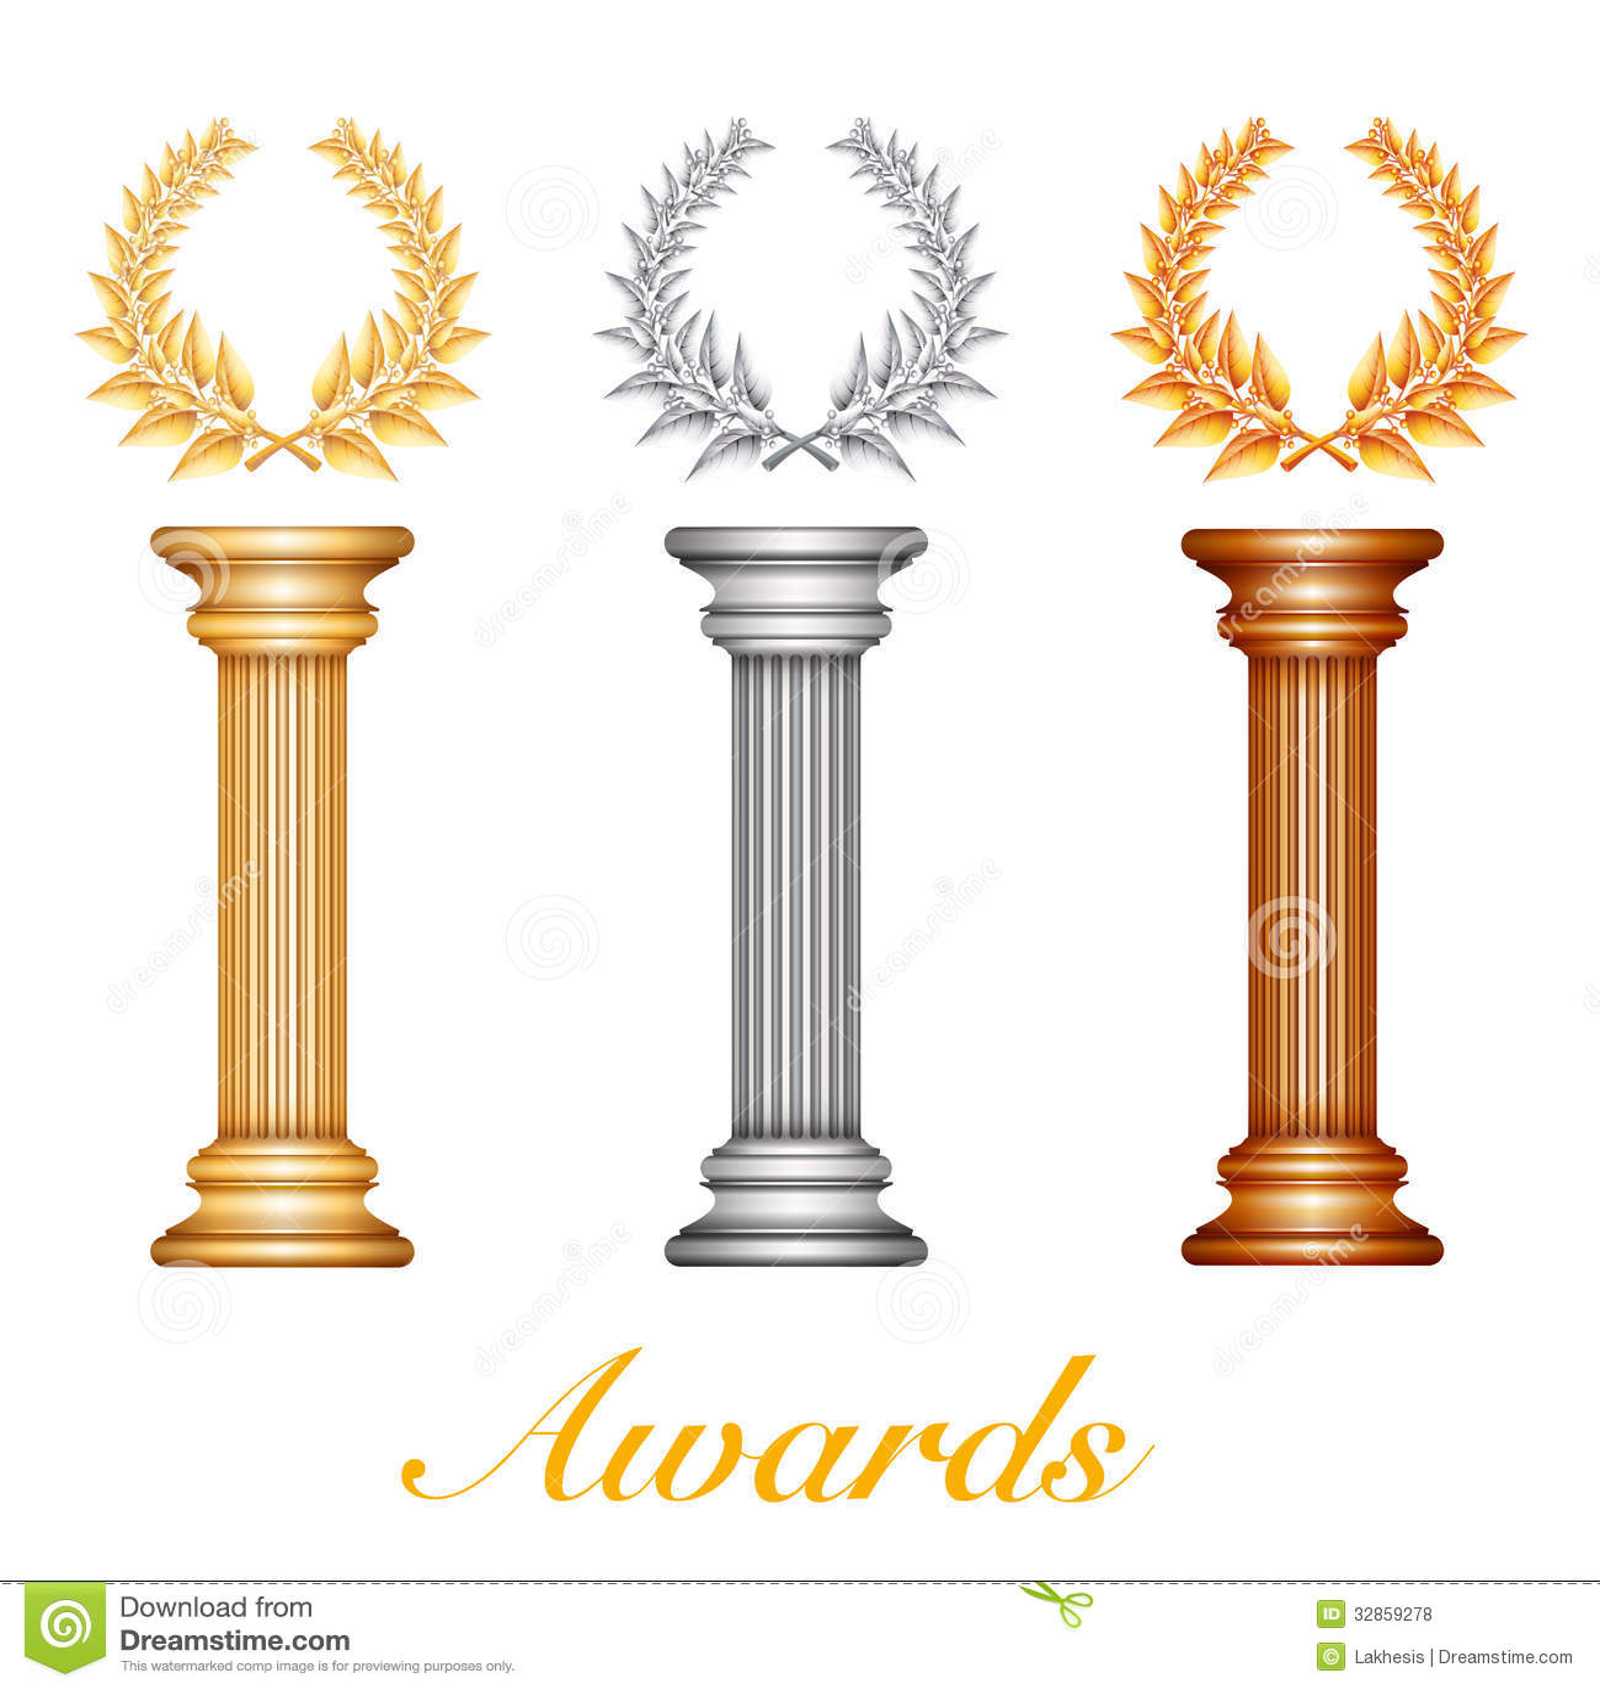 Gold Silver And Bronze Award Columns Stock Vector - Image ...